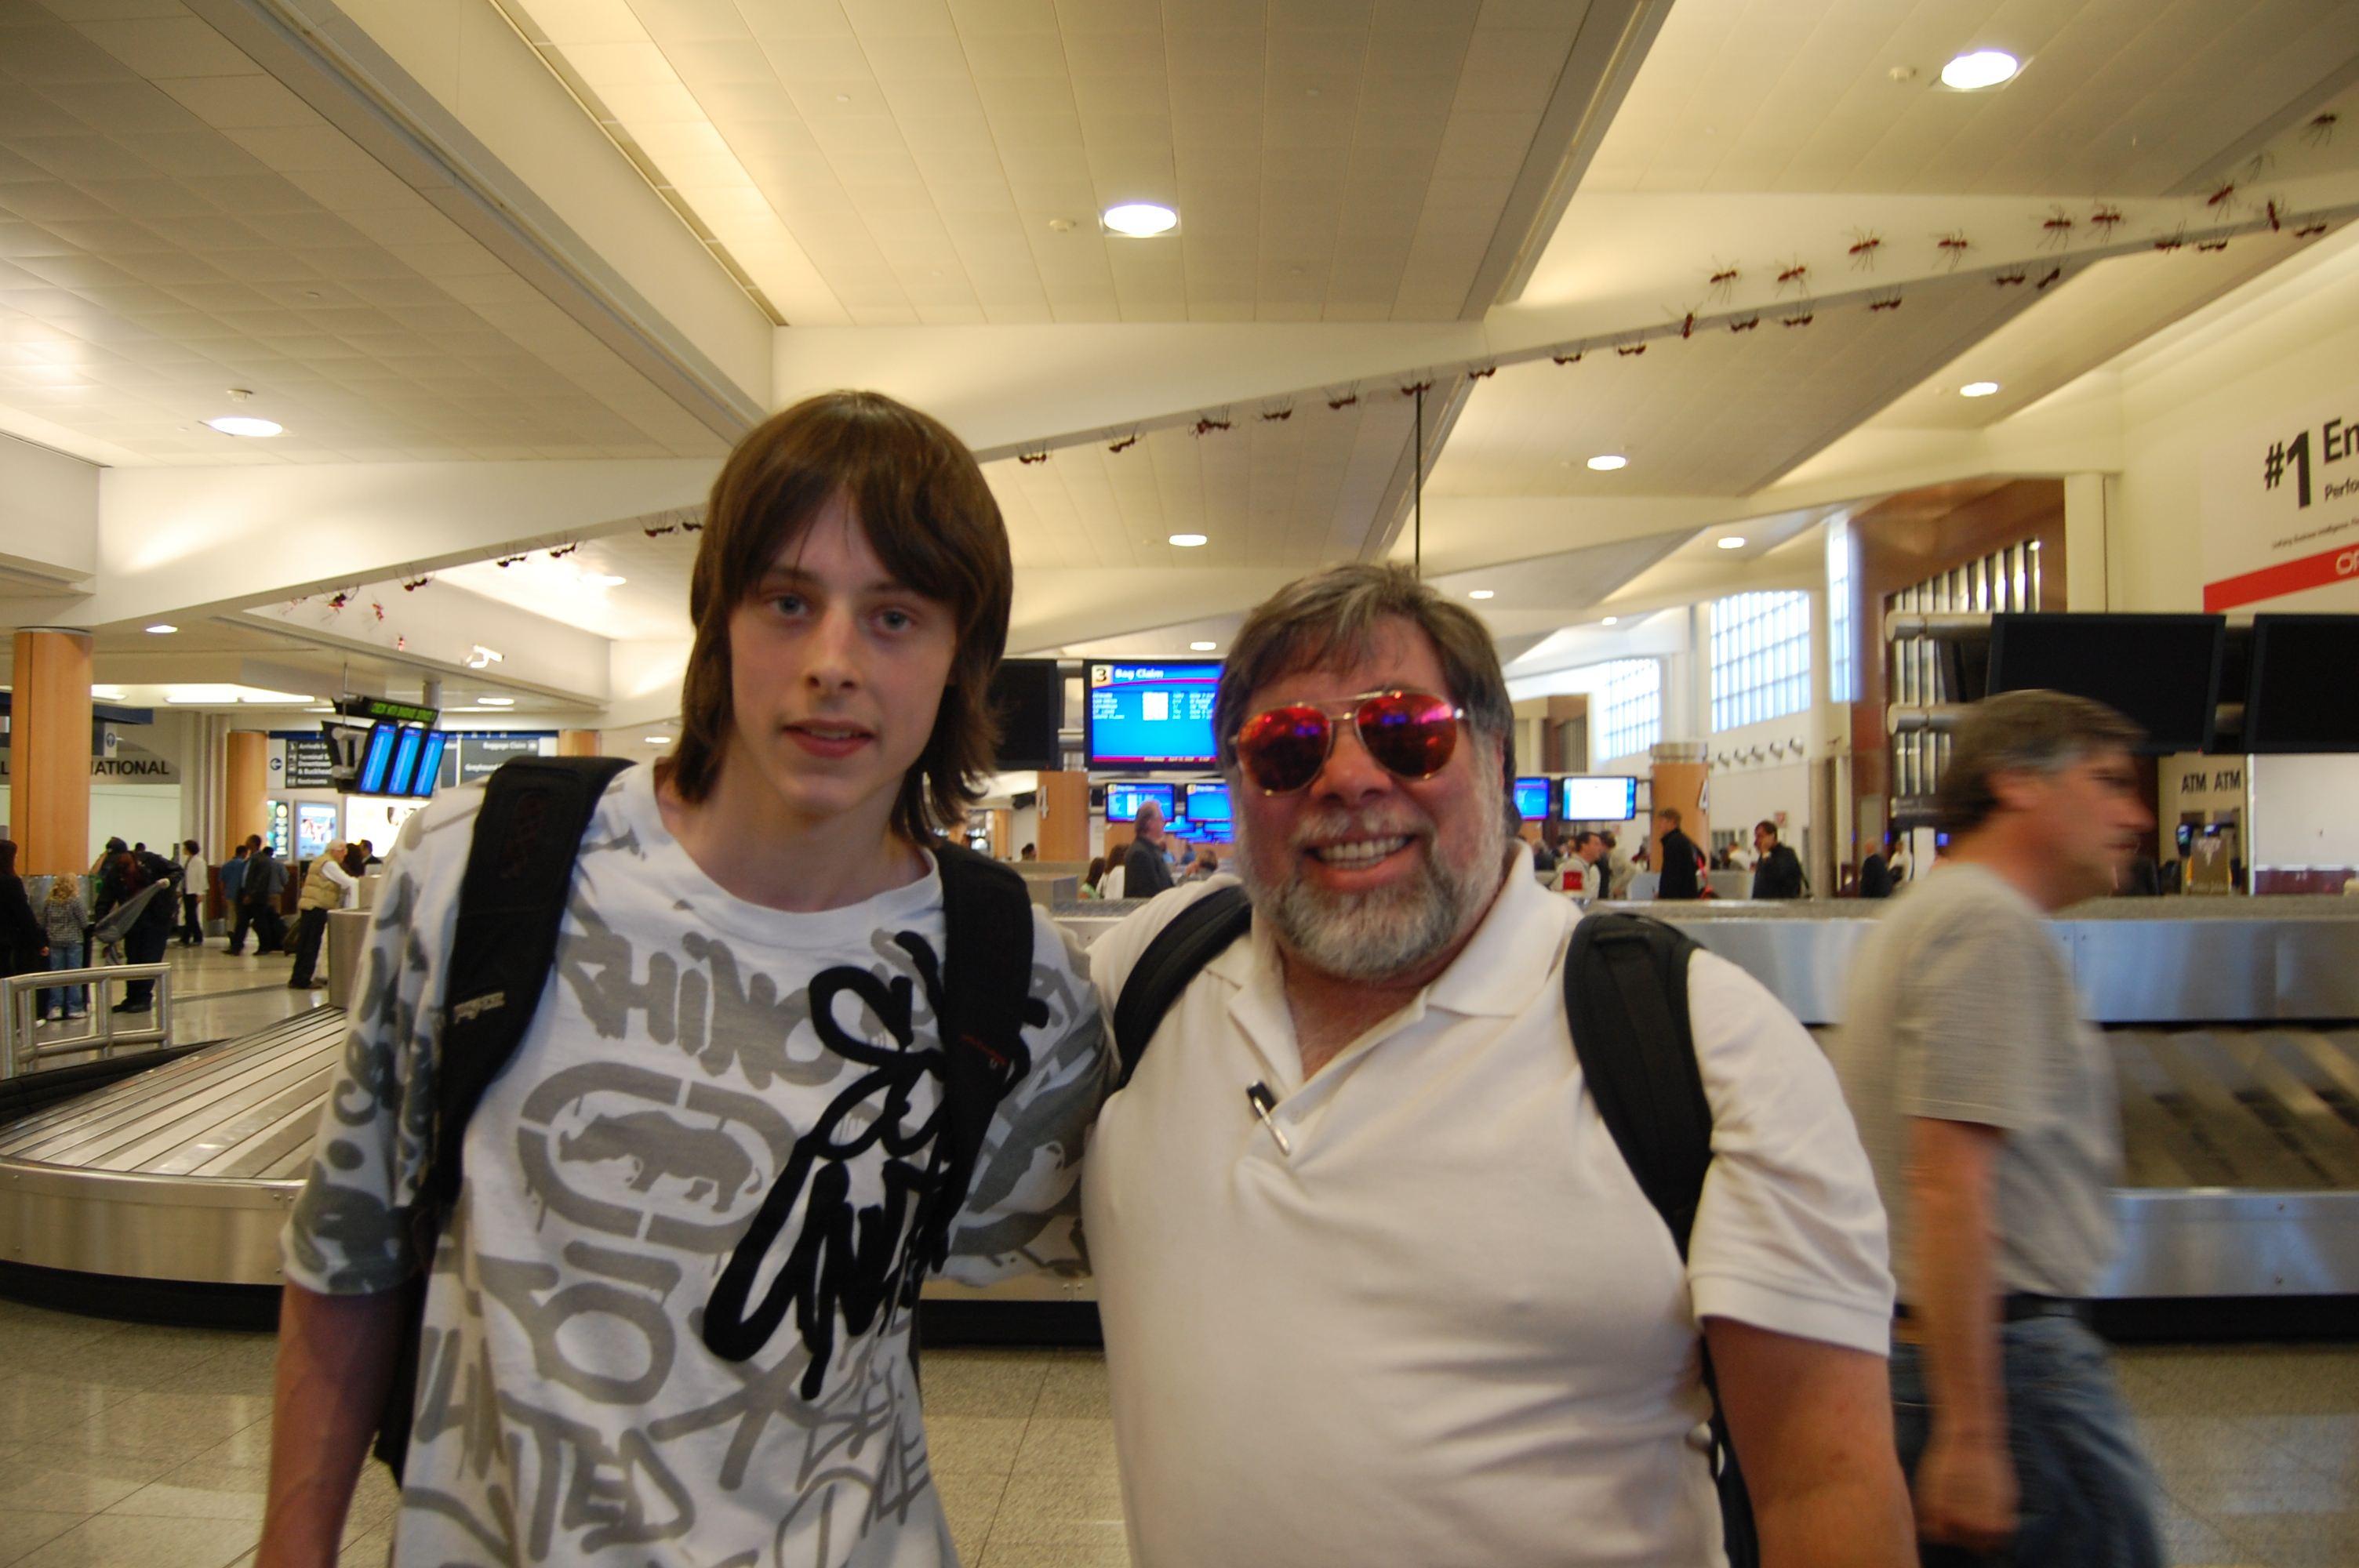 Meeting Steve Woz